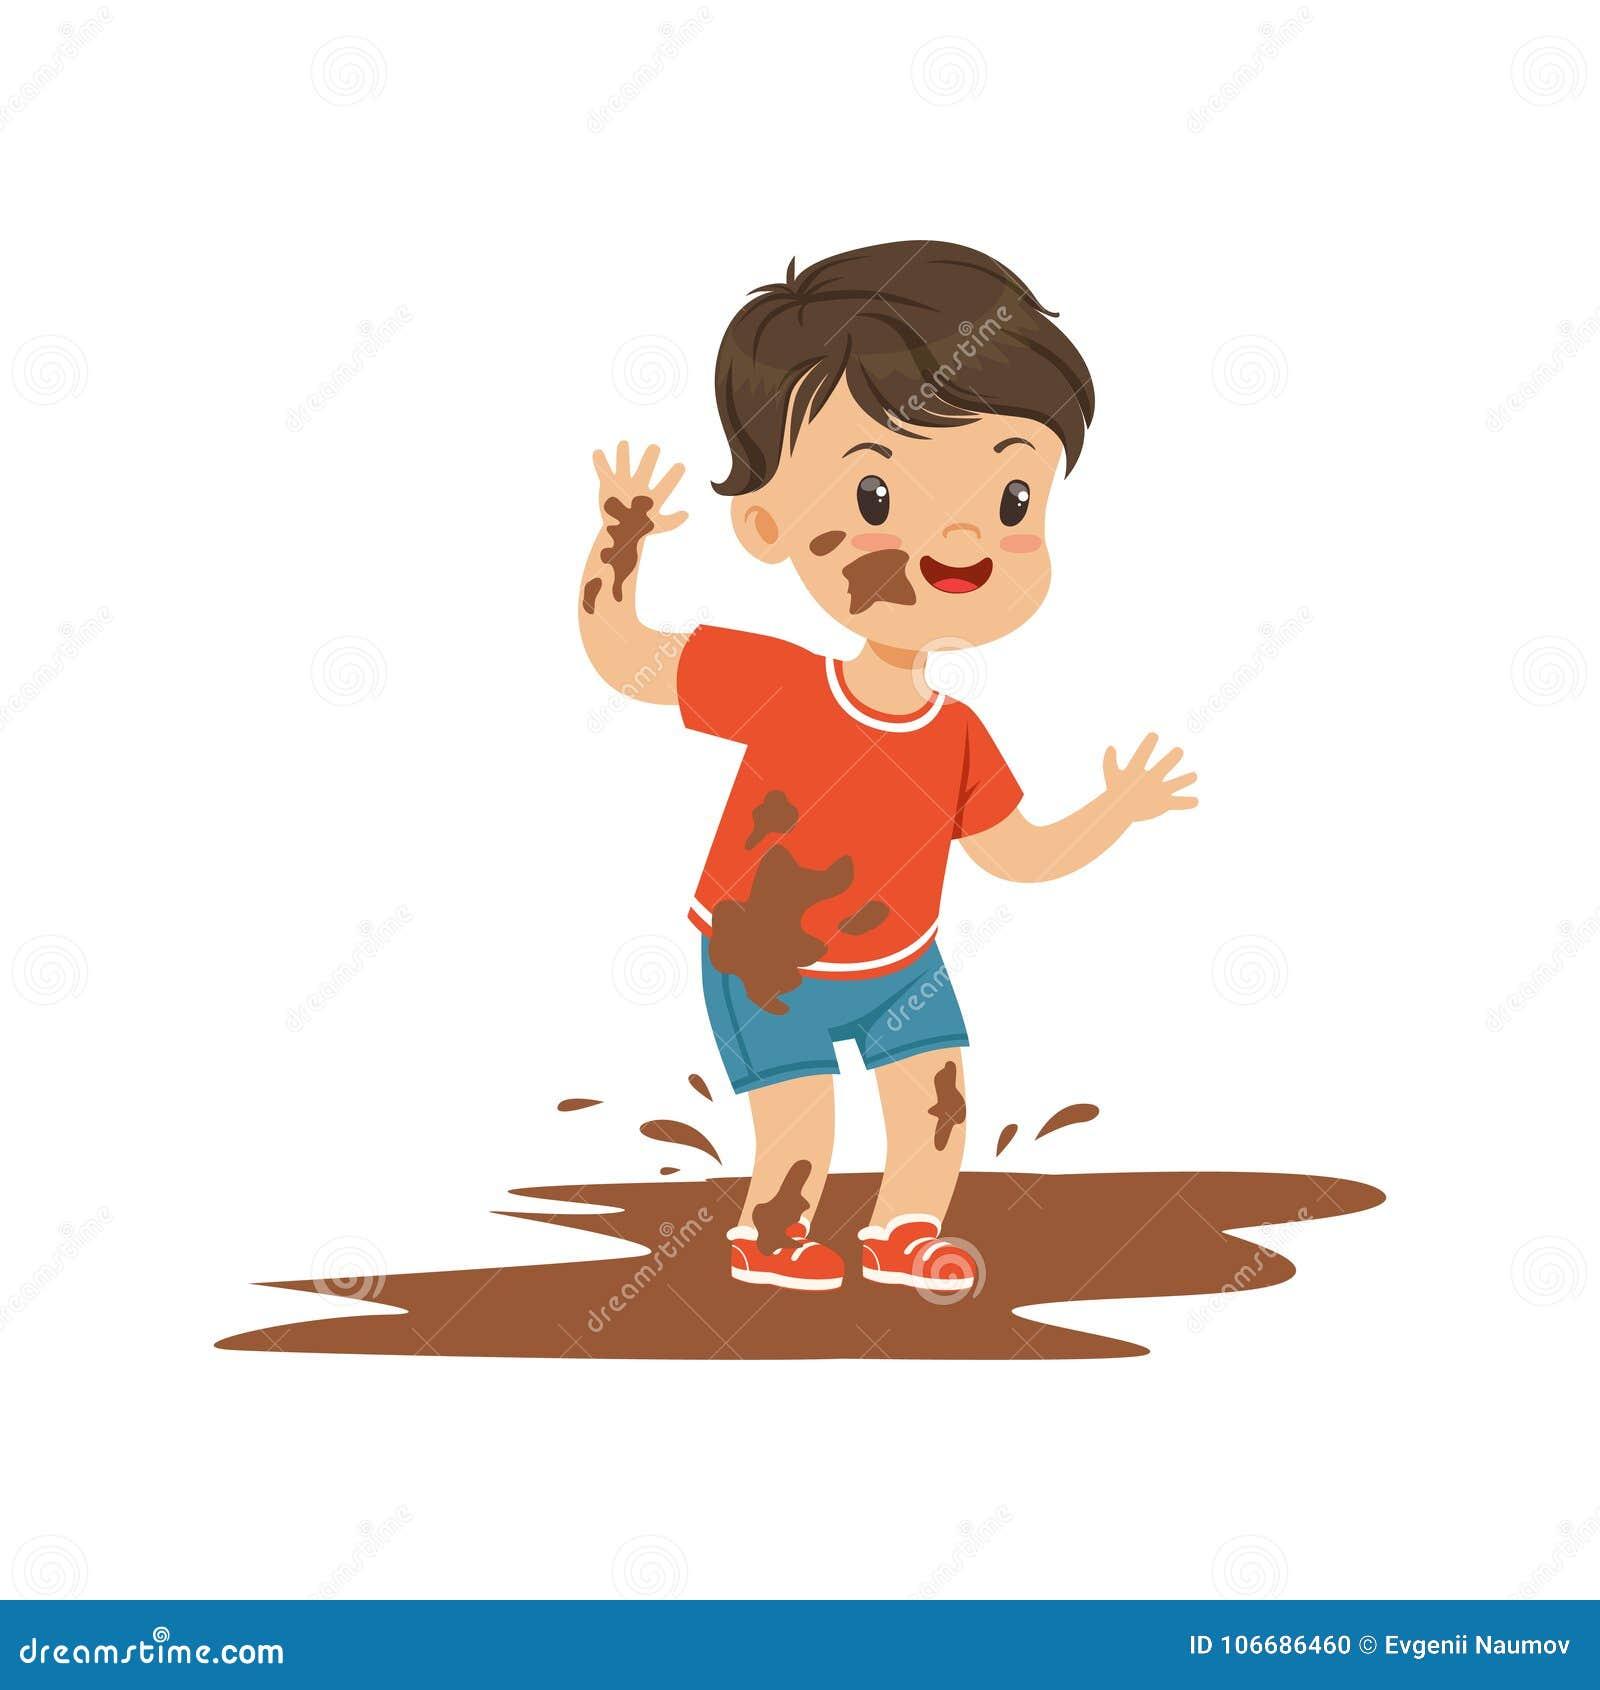 Cute bully boy jumping in a dirt, hoodlum cheerful little kid, bad child behavior vector Illustration